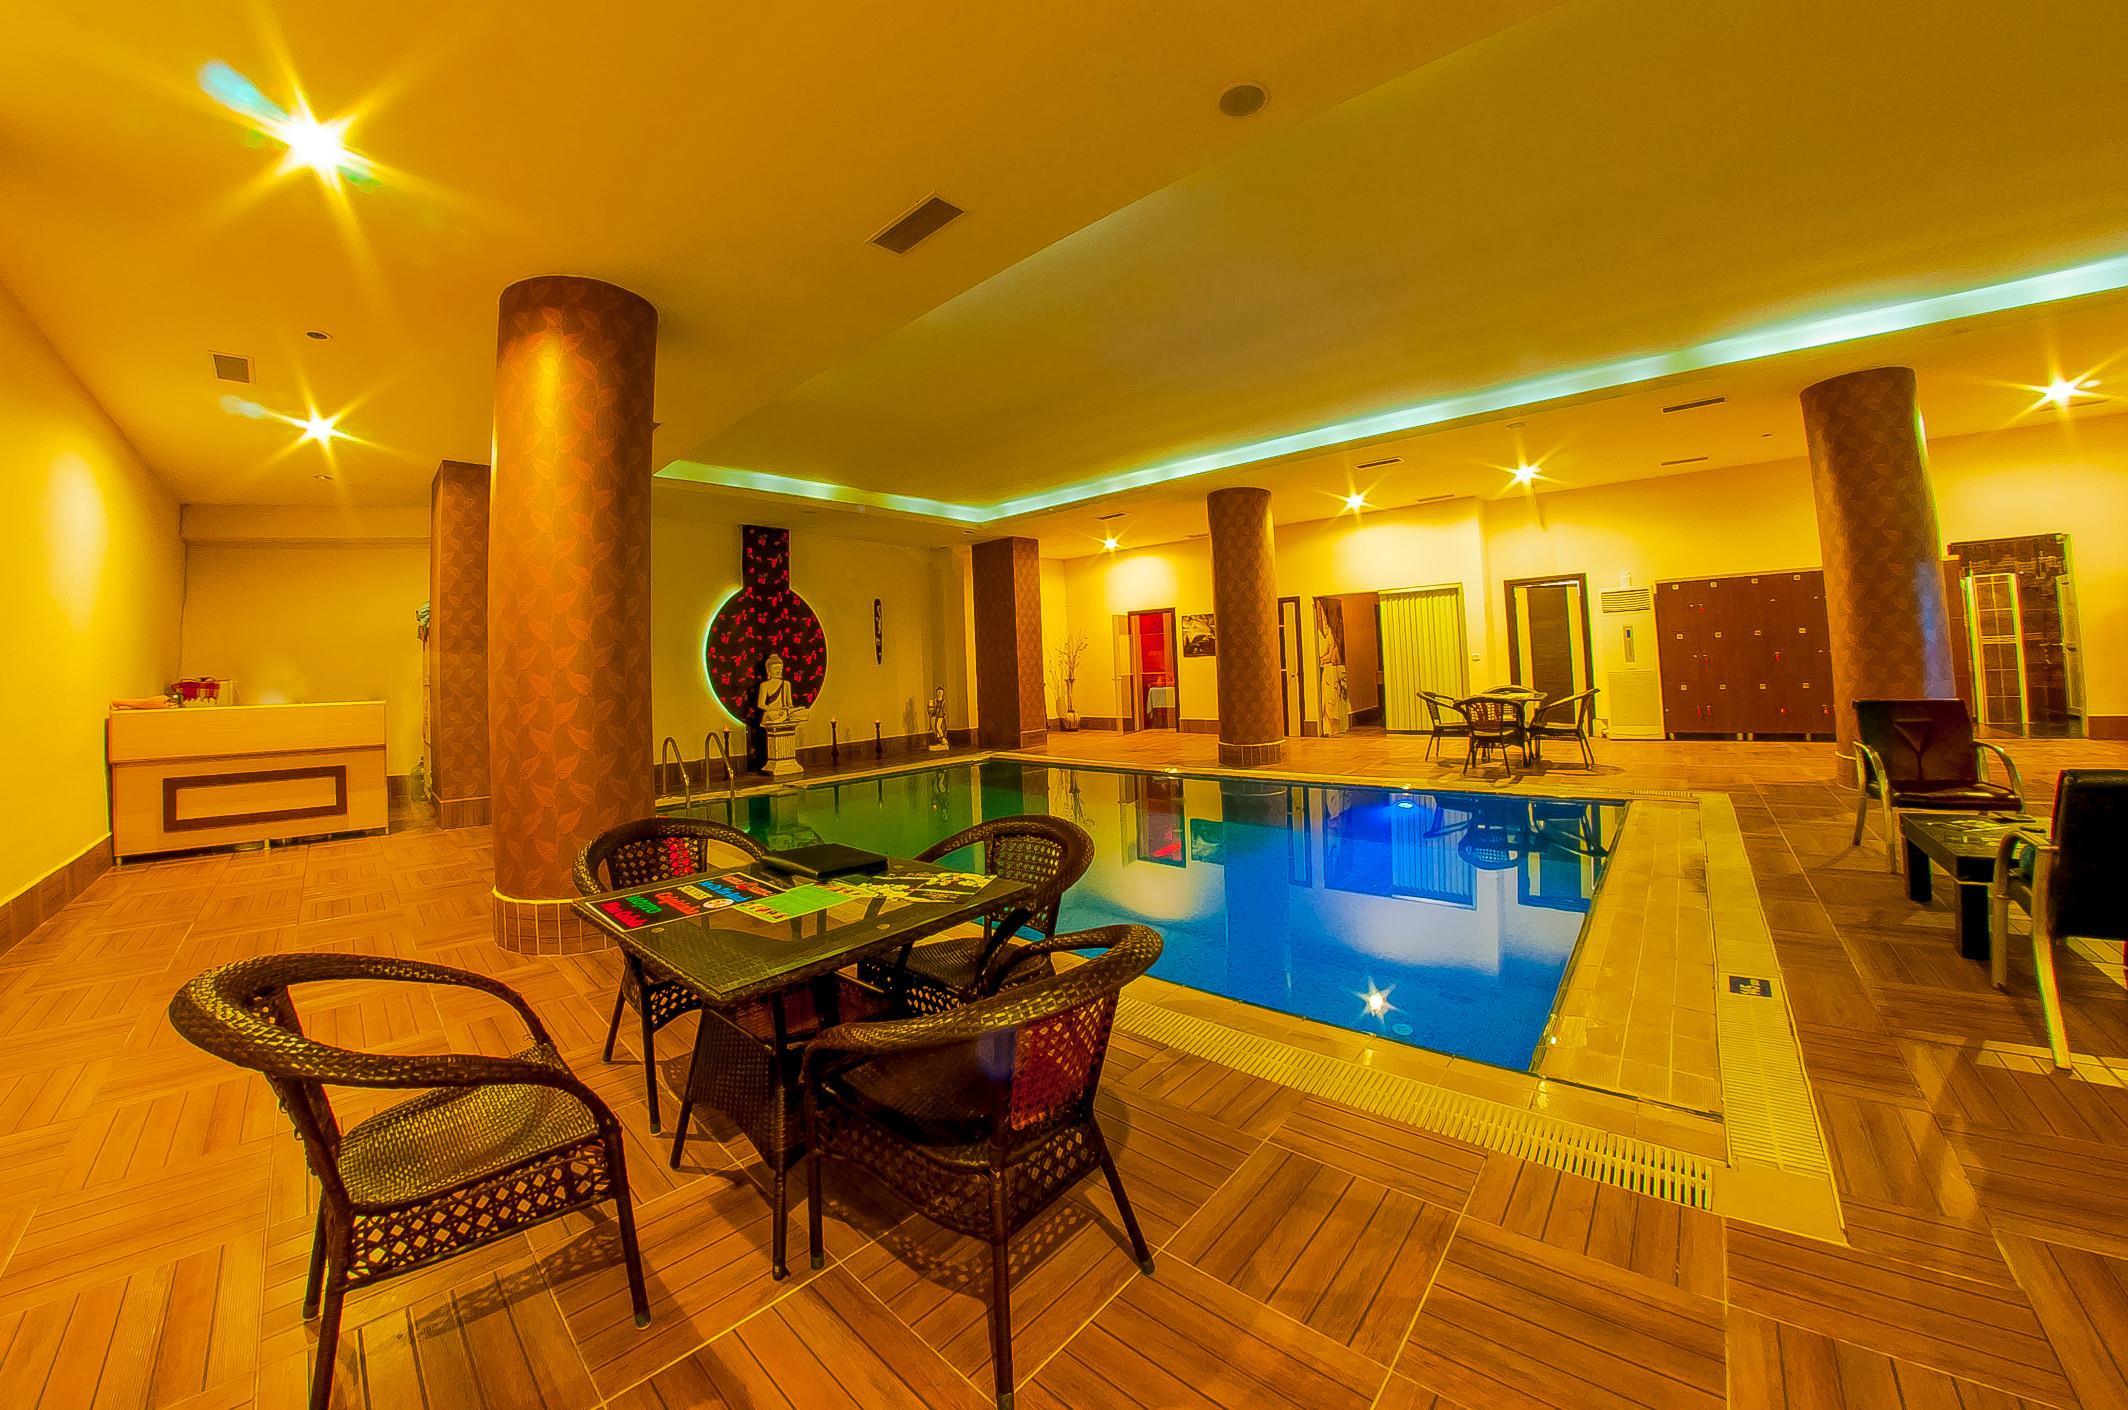 http://www.orextravel.sk/OREX/hotelphotos/side-royal-paradise-general-0018.jpg